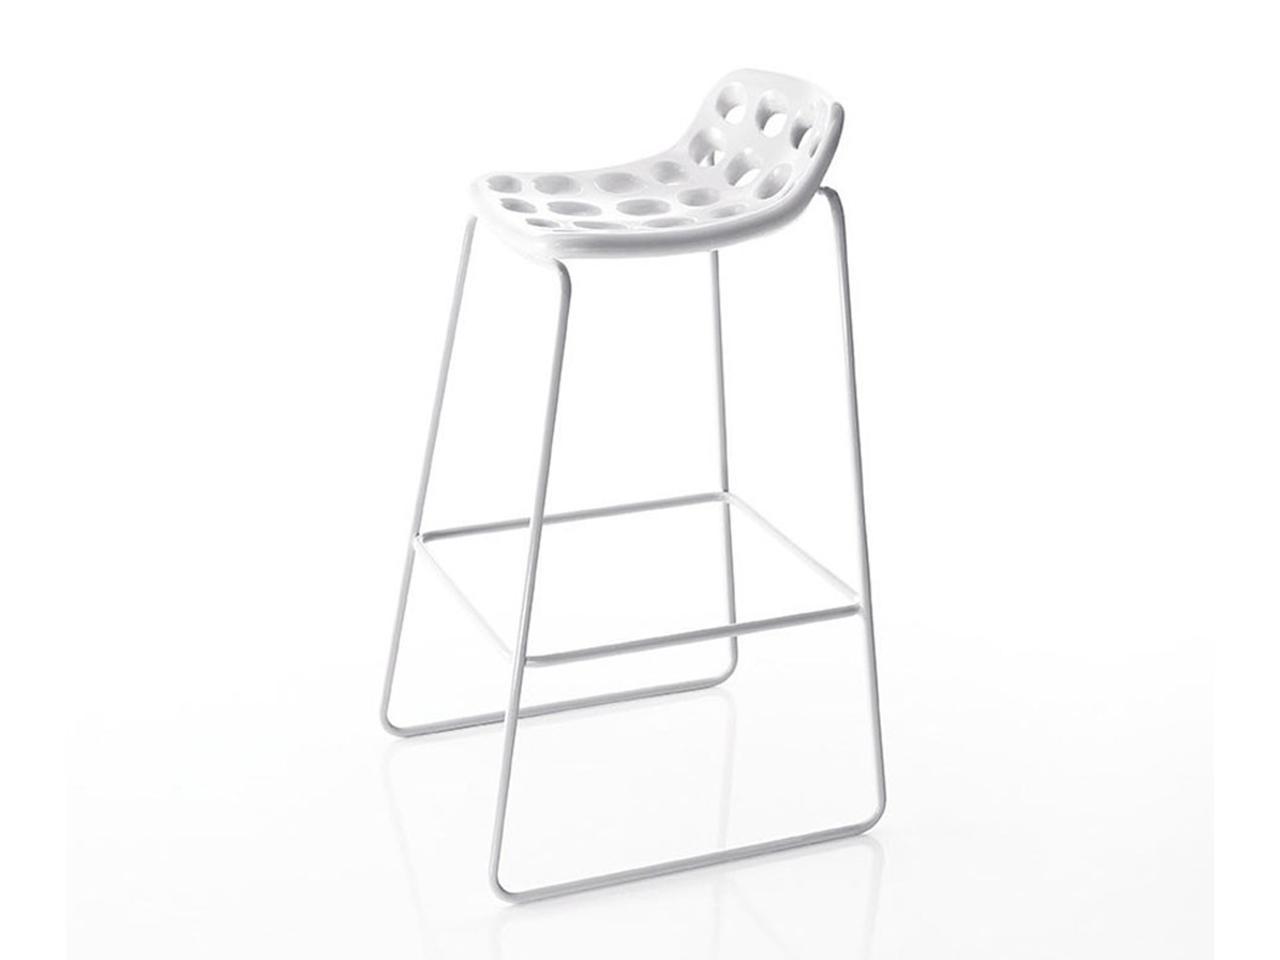 Барный пластиковый стул Chips